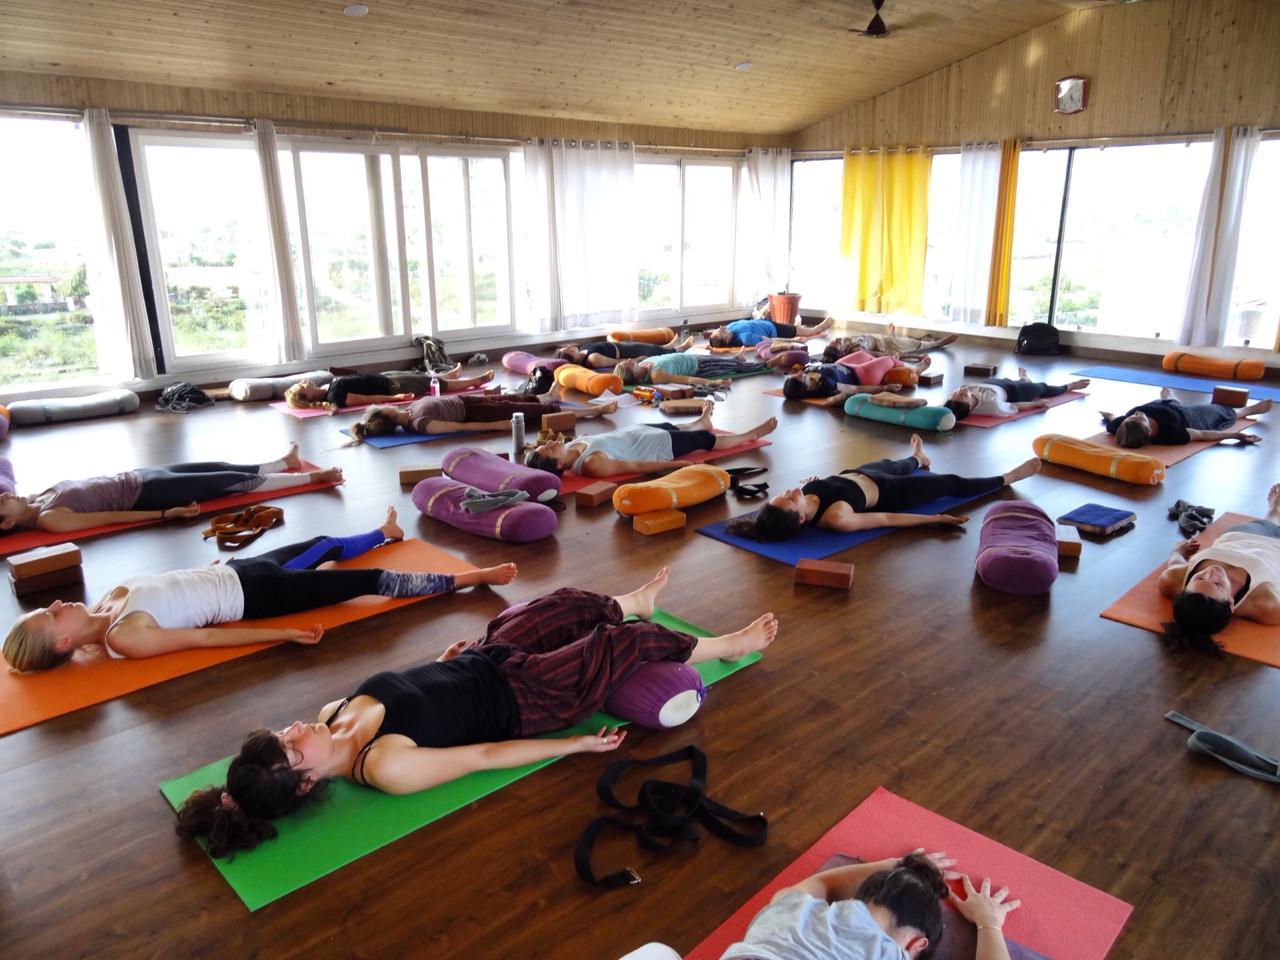 Best Yoga Mat 2020.Top 3 Yoga Retreats In Southeast Asia In 2019 2020 Gyan